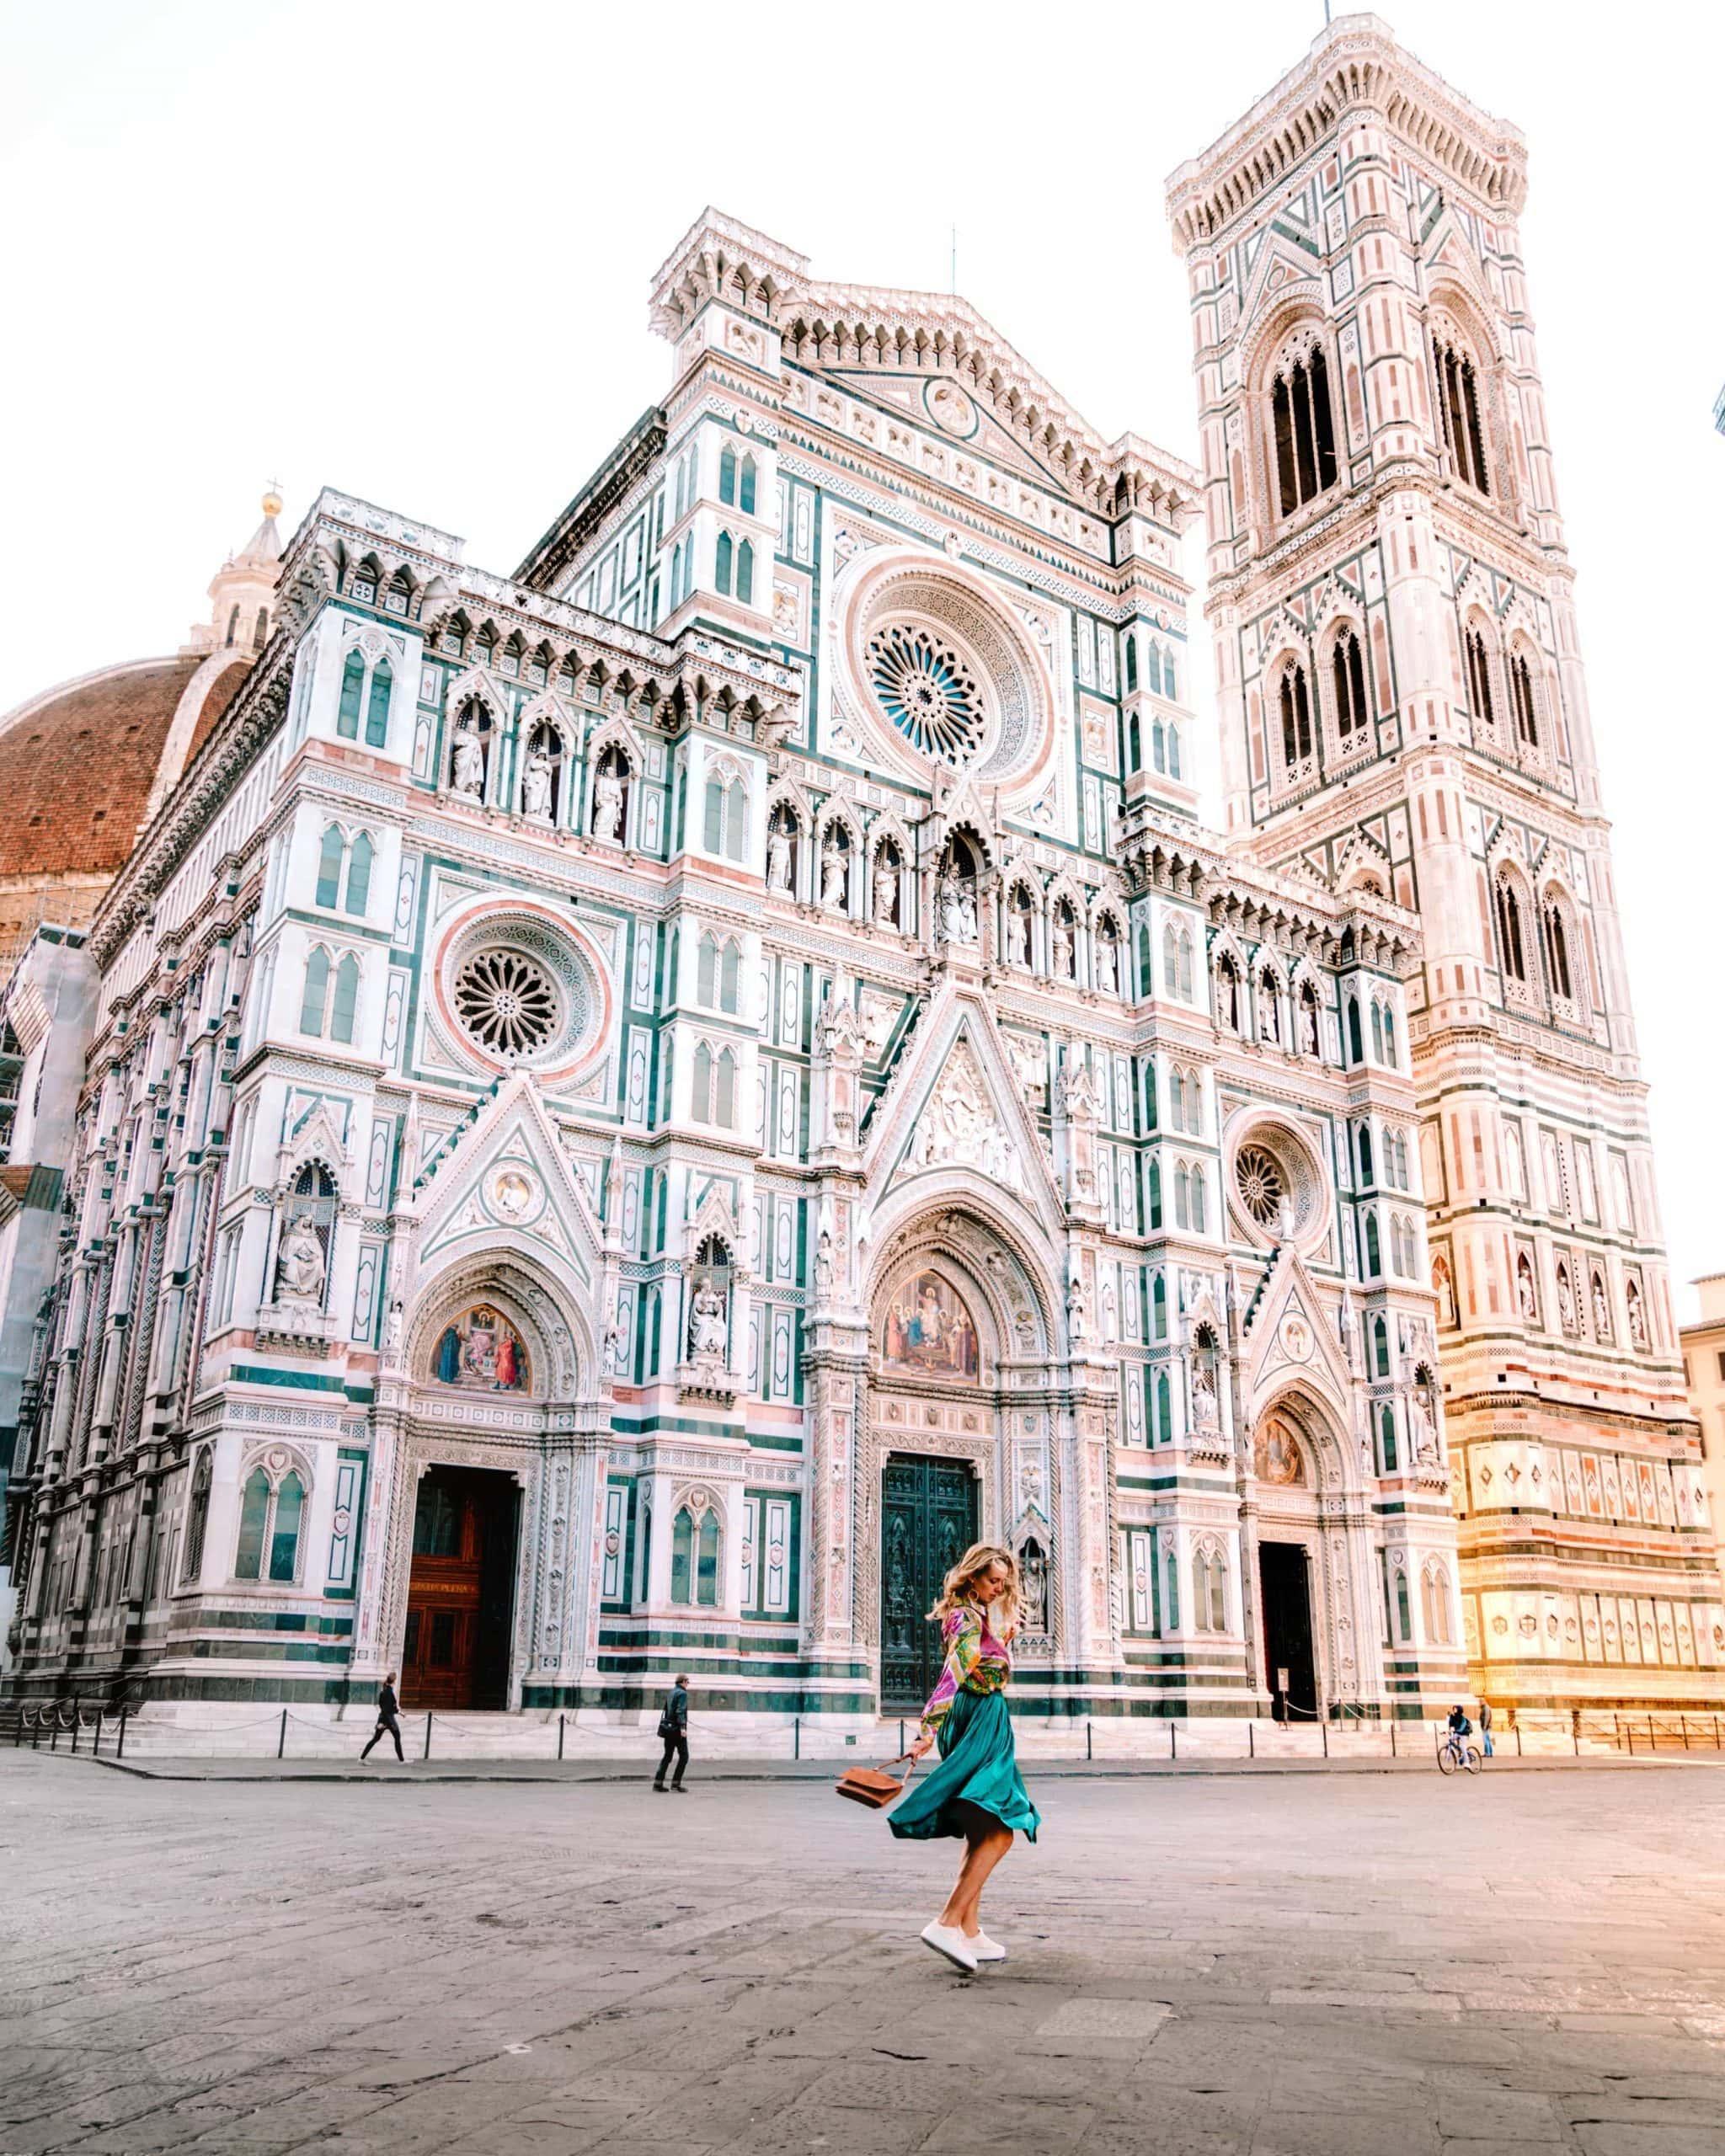 bezienswaardigheden Florence kathedraal Santa Maria del Fiore